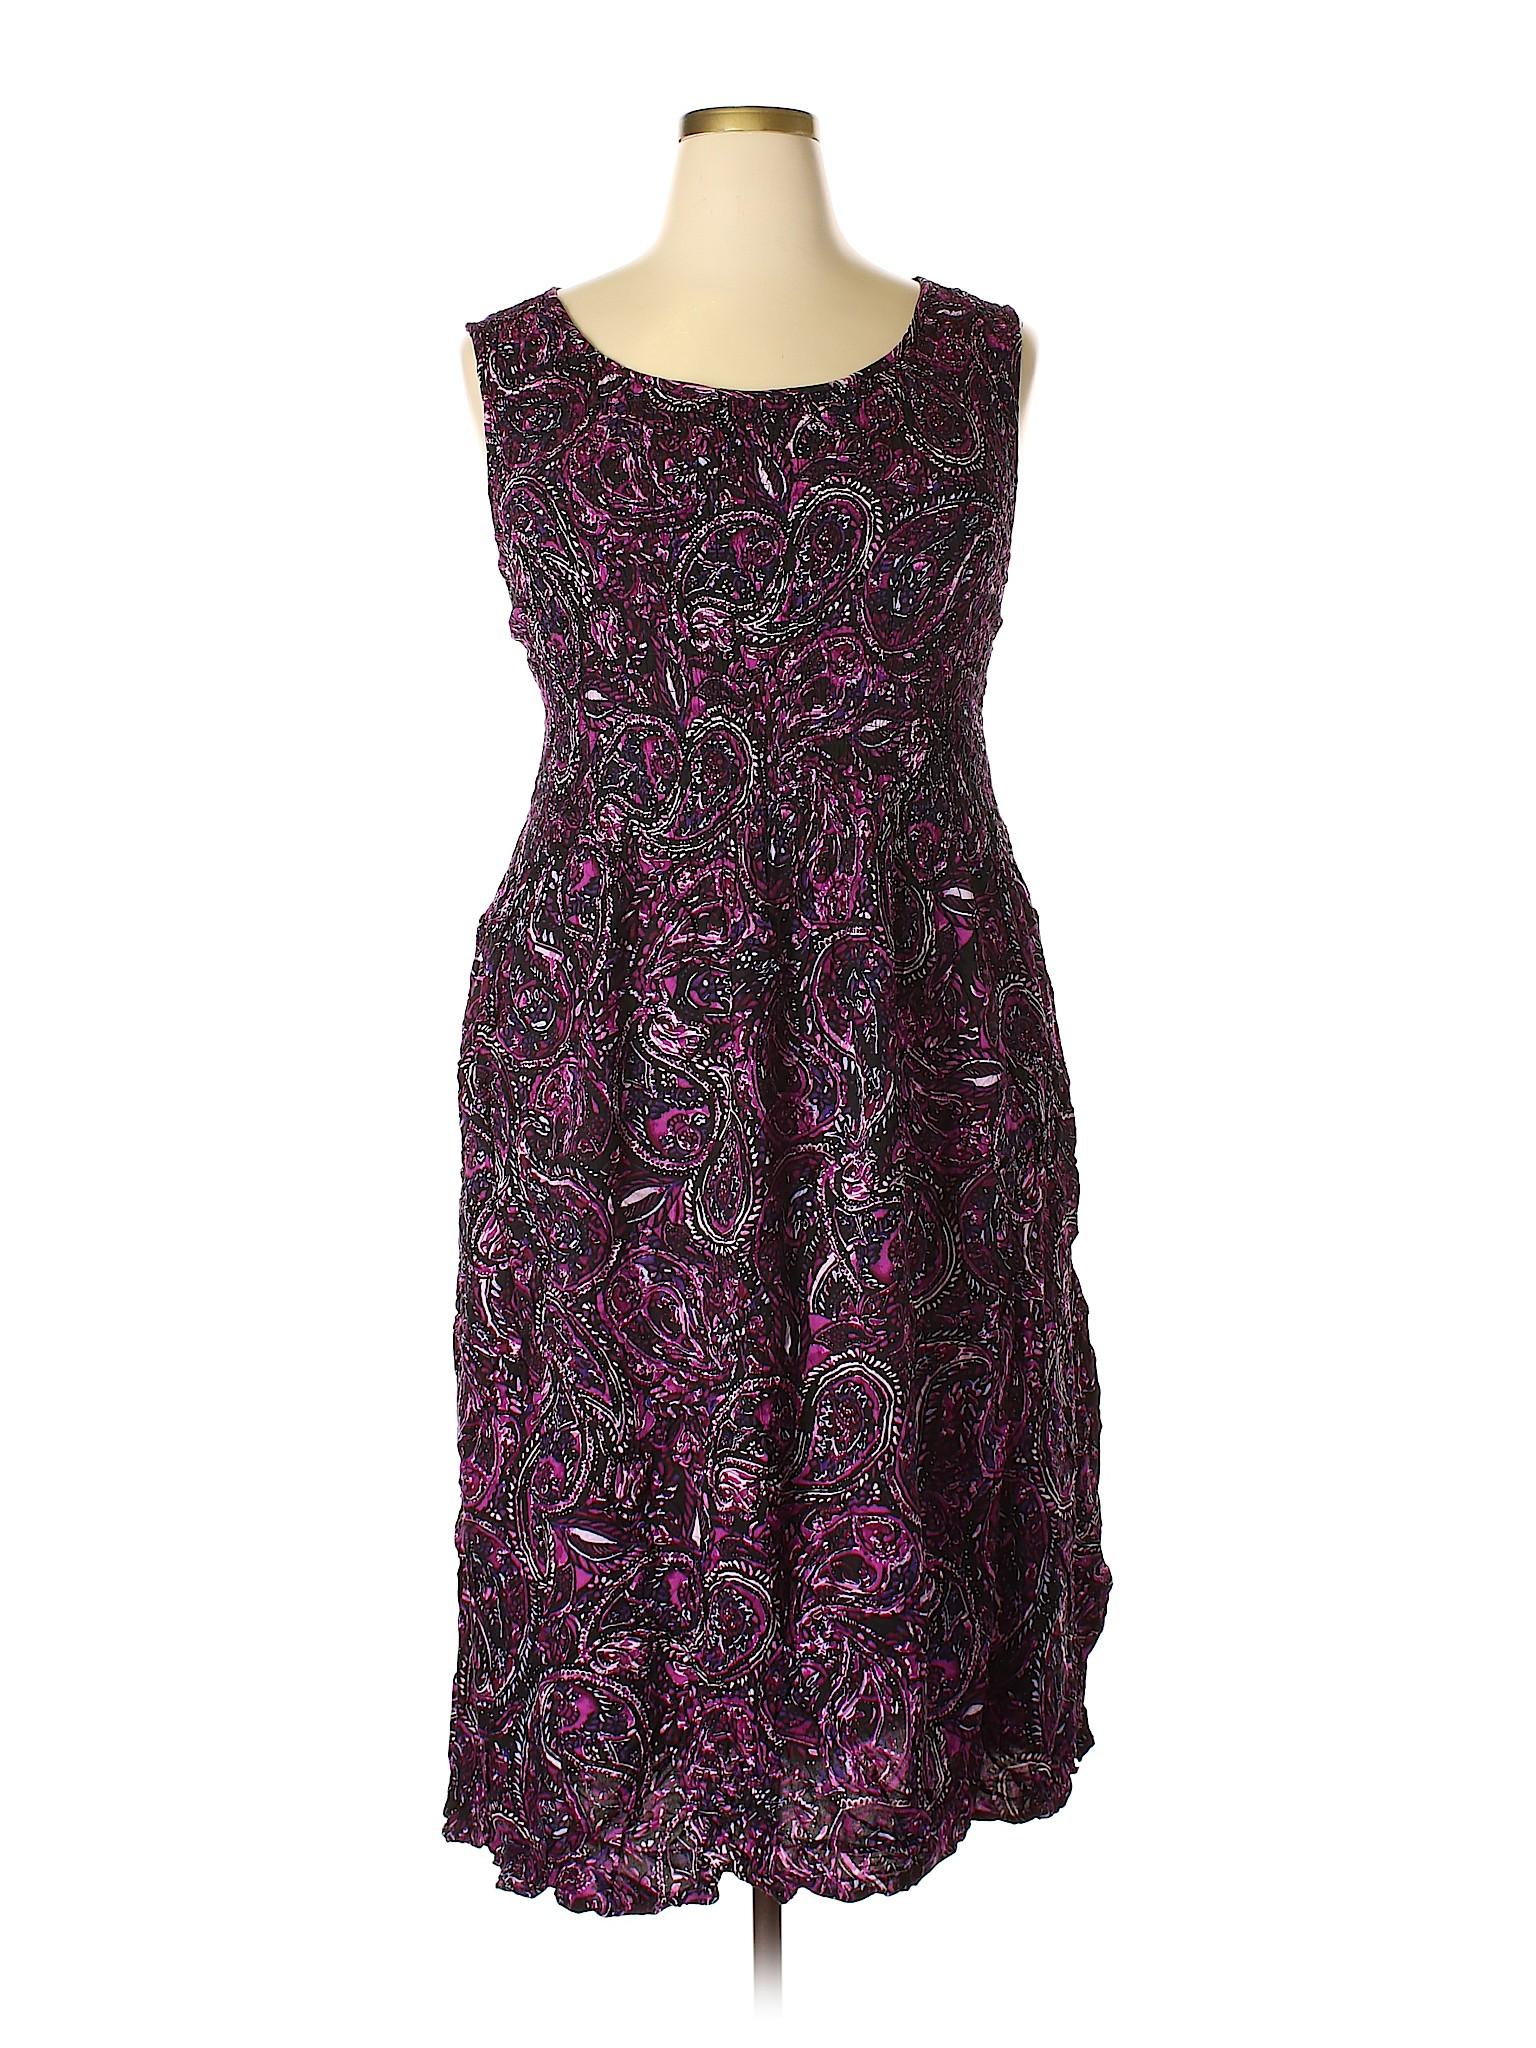 amp; Dress Boutique winter Barrow Croft Casual 8Tq4EB